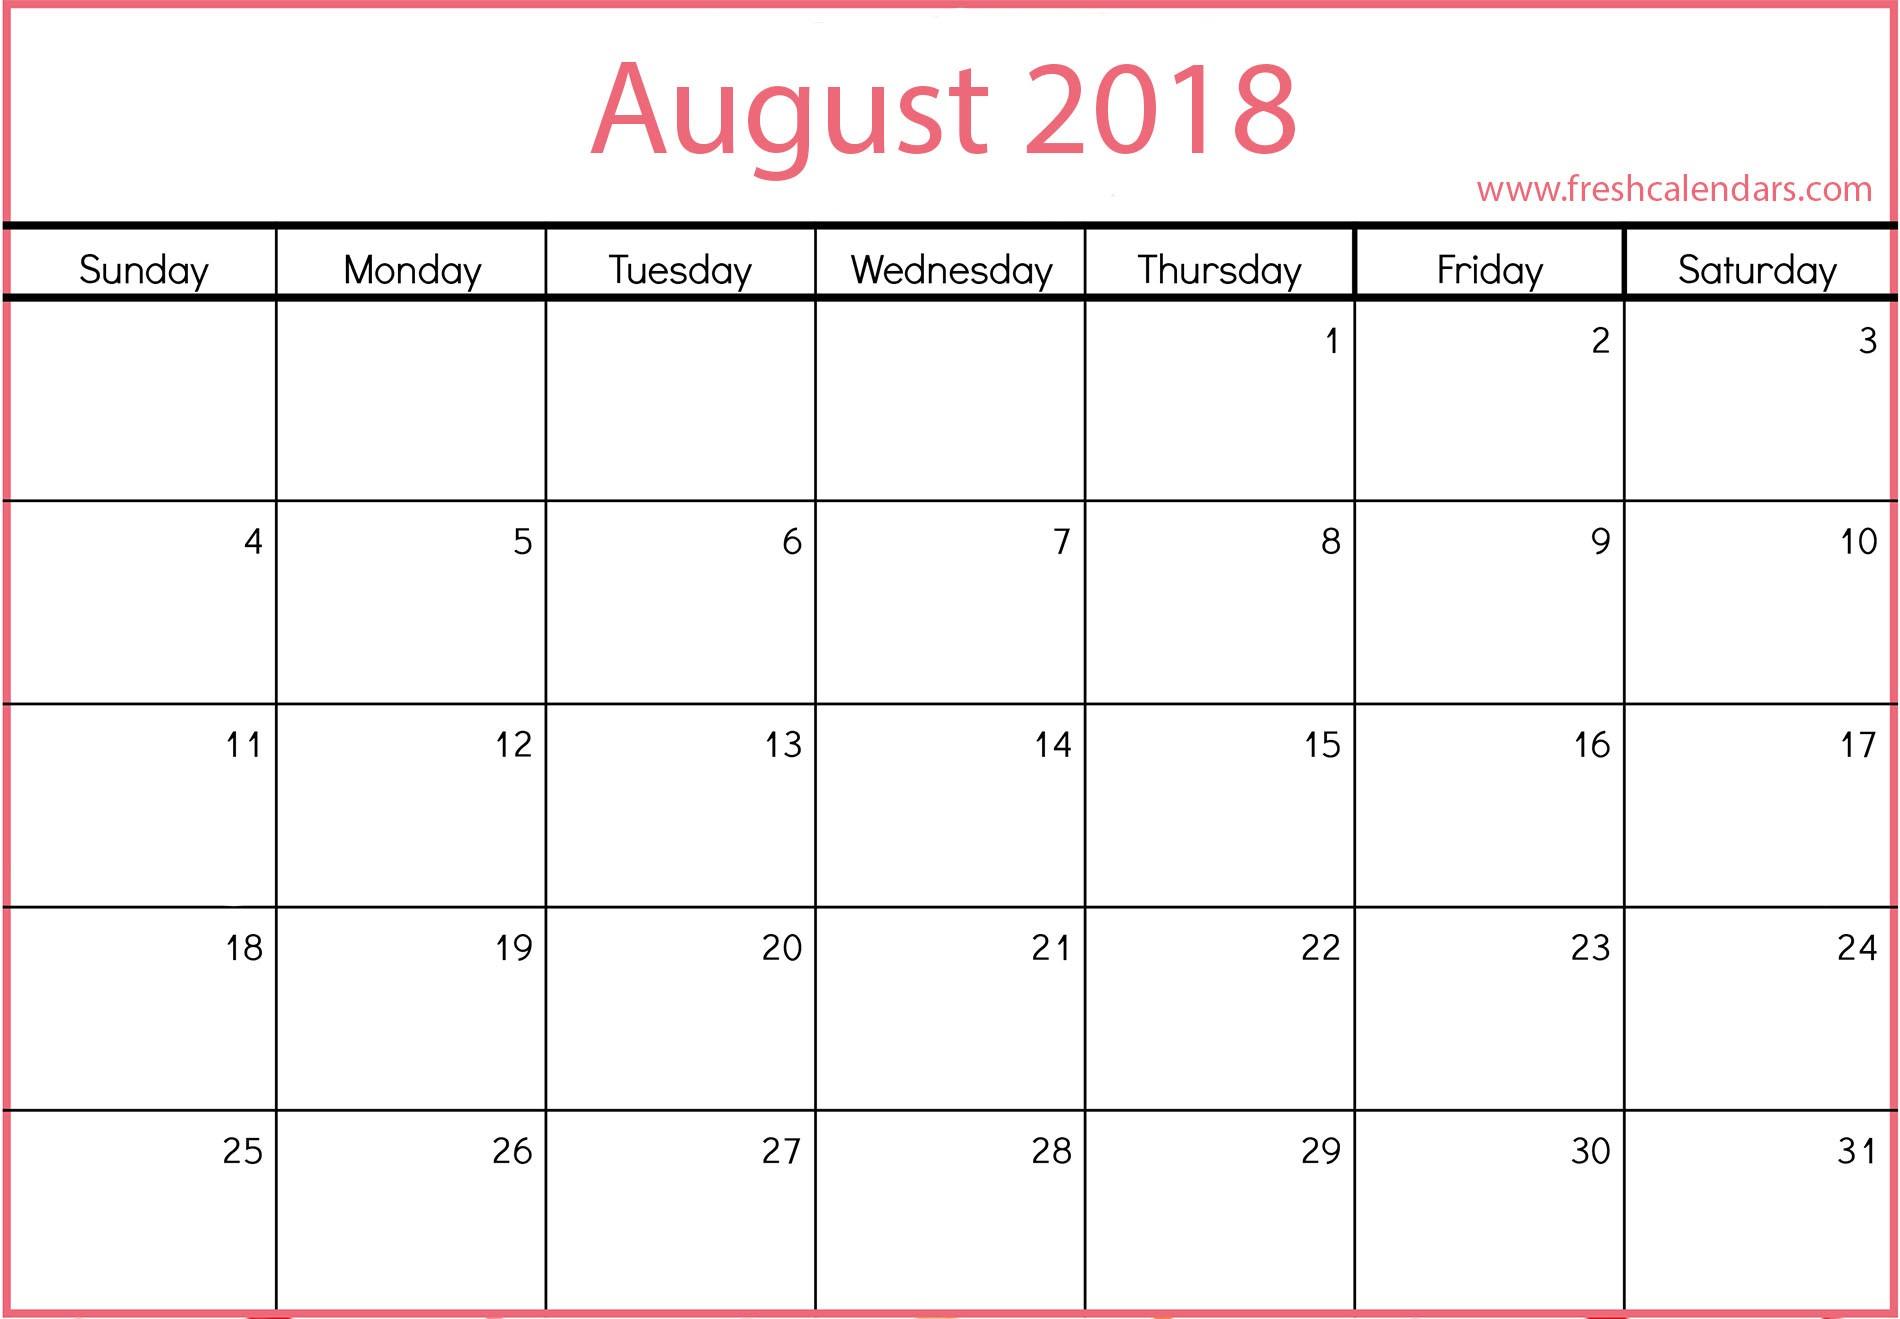 Calendars Printable 2019 Printable August 2019 Calendar Fresh Calendars